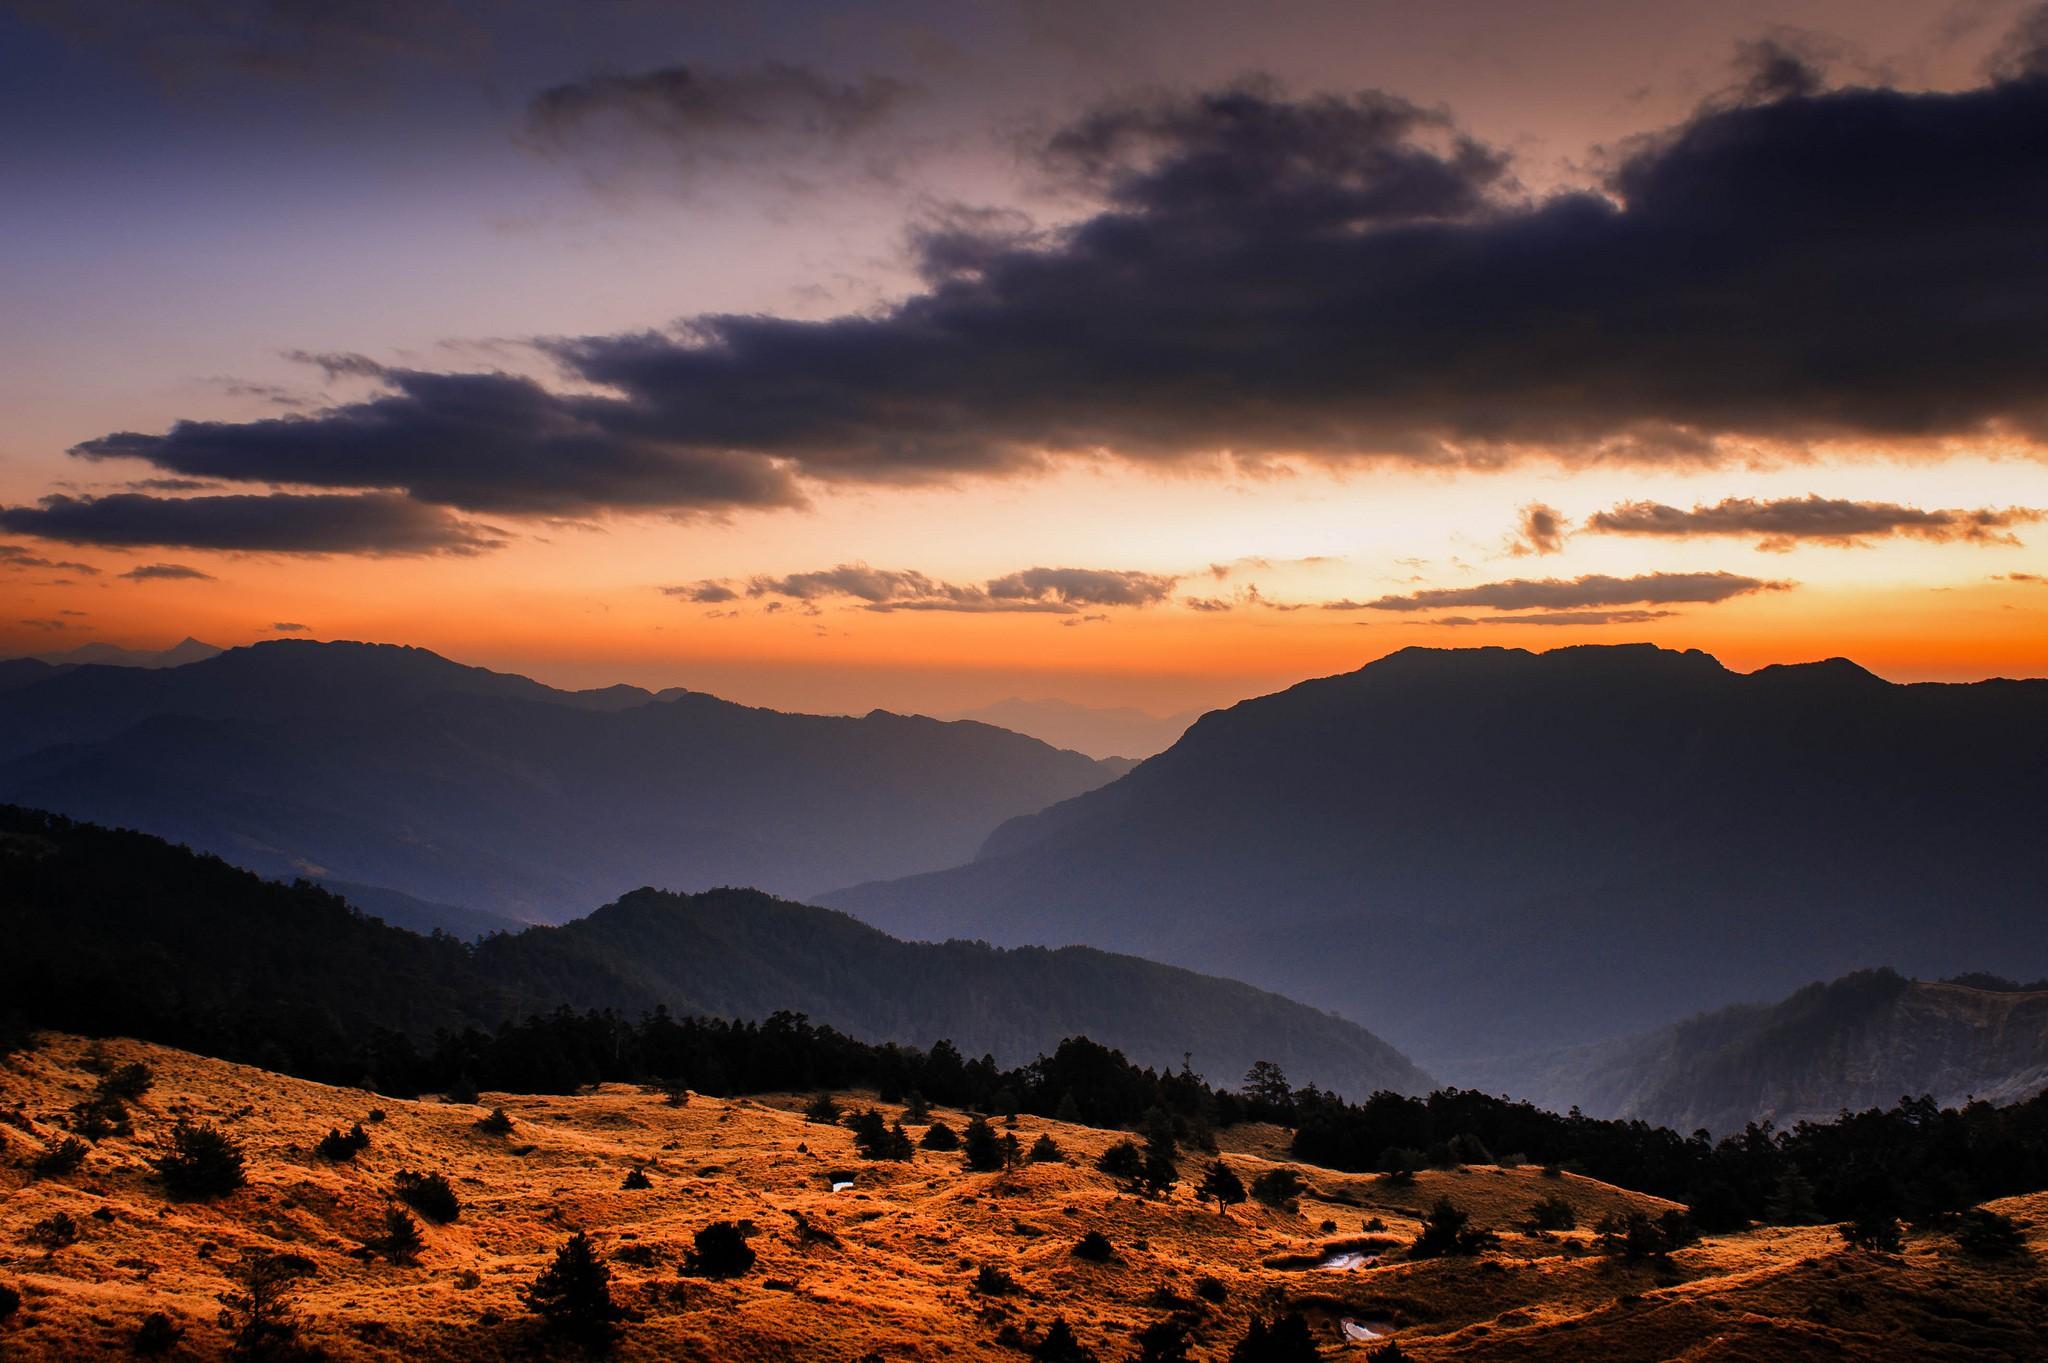 Sunset at Qingjing Farm | © 白士 李 / Flickr